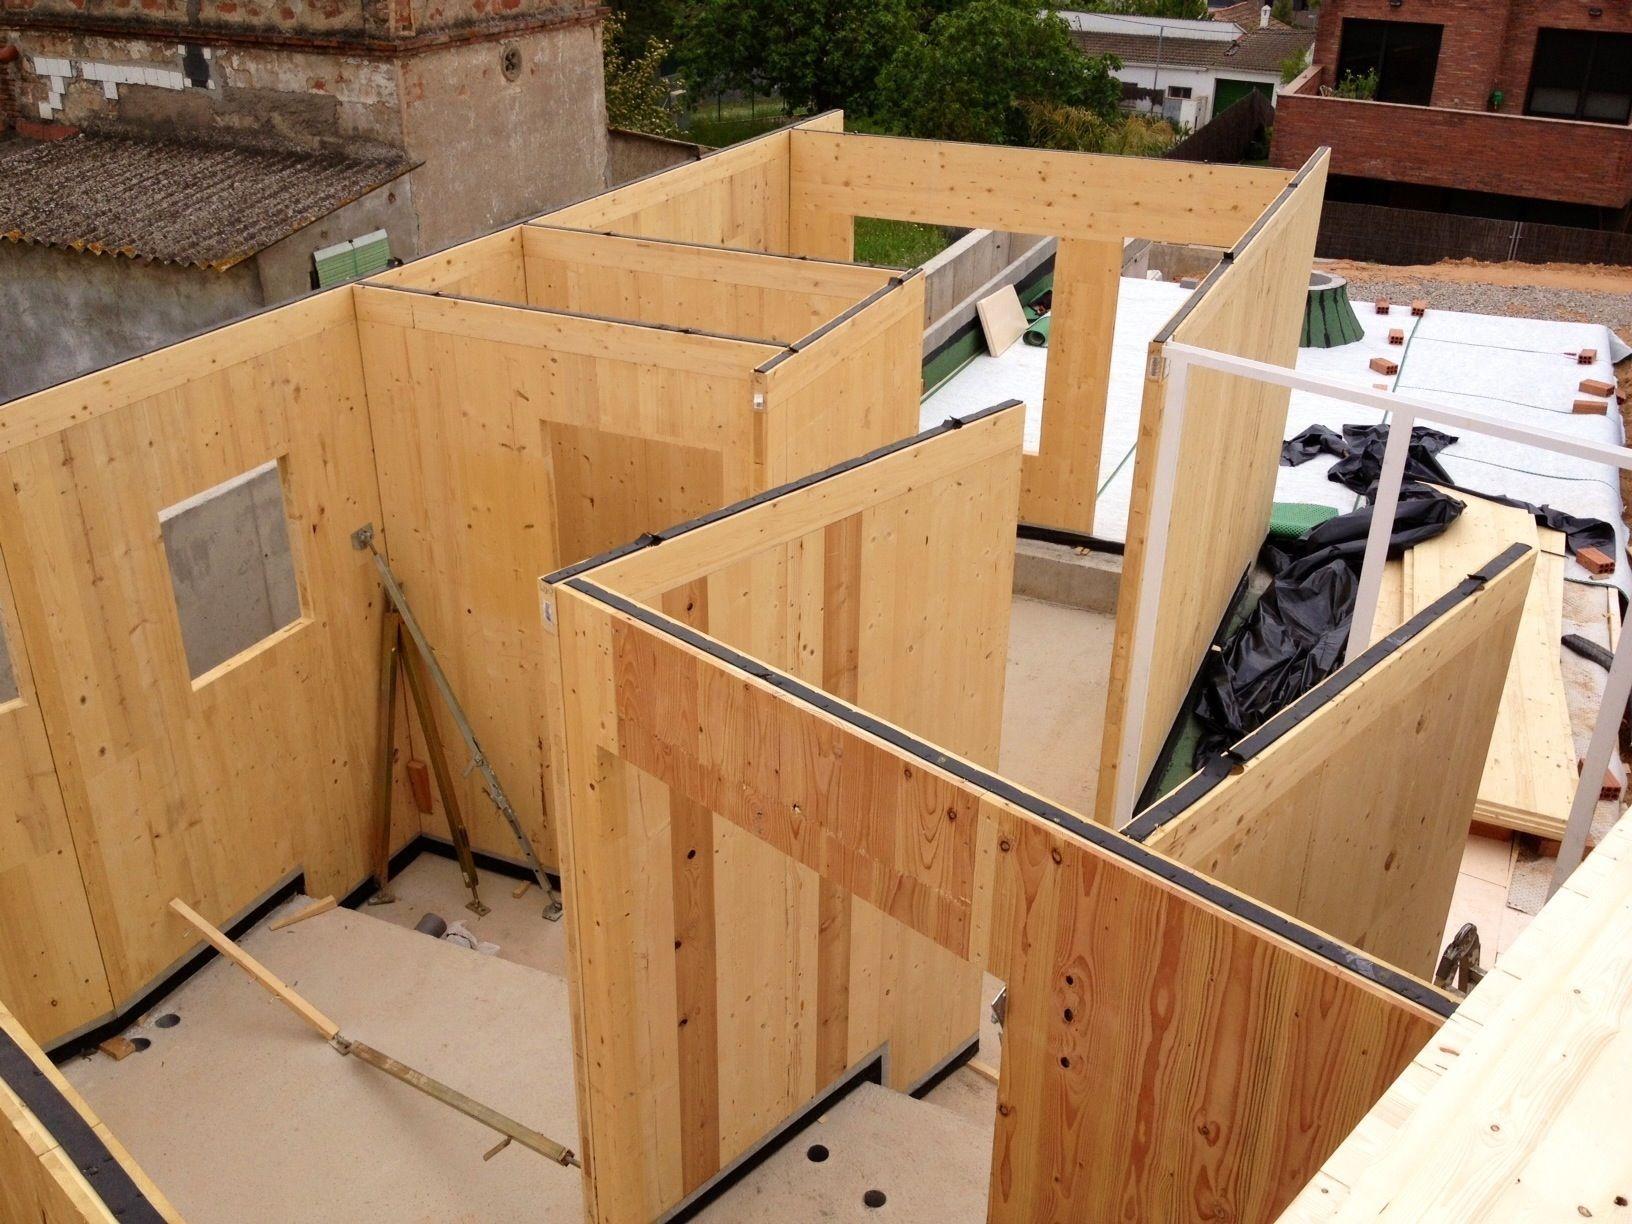 vivienda de madera estructura | Cross Laminated Timber | Pinterest ...